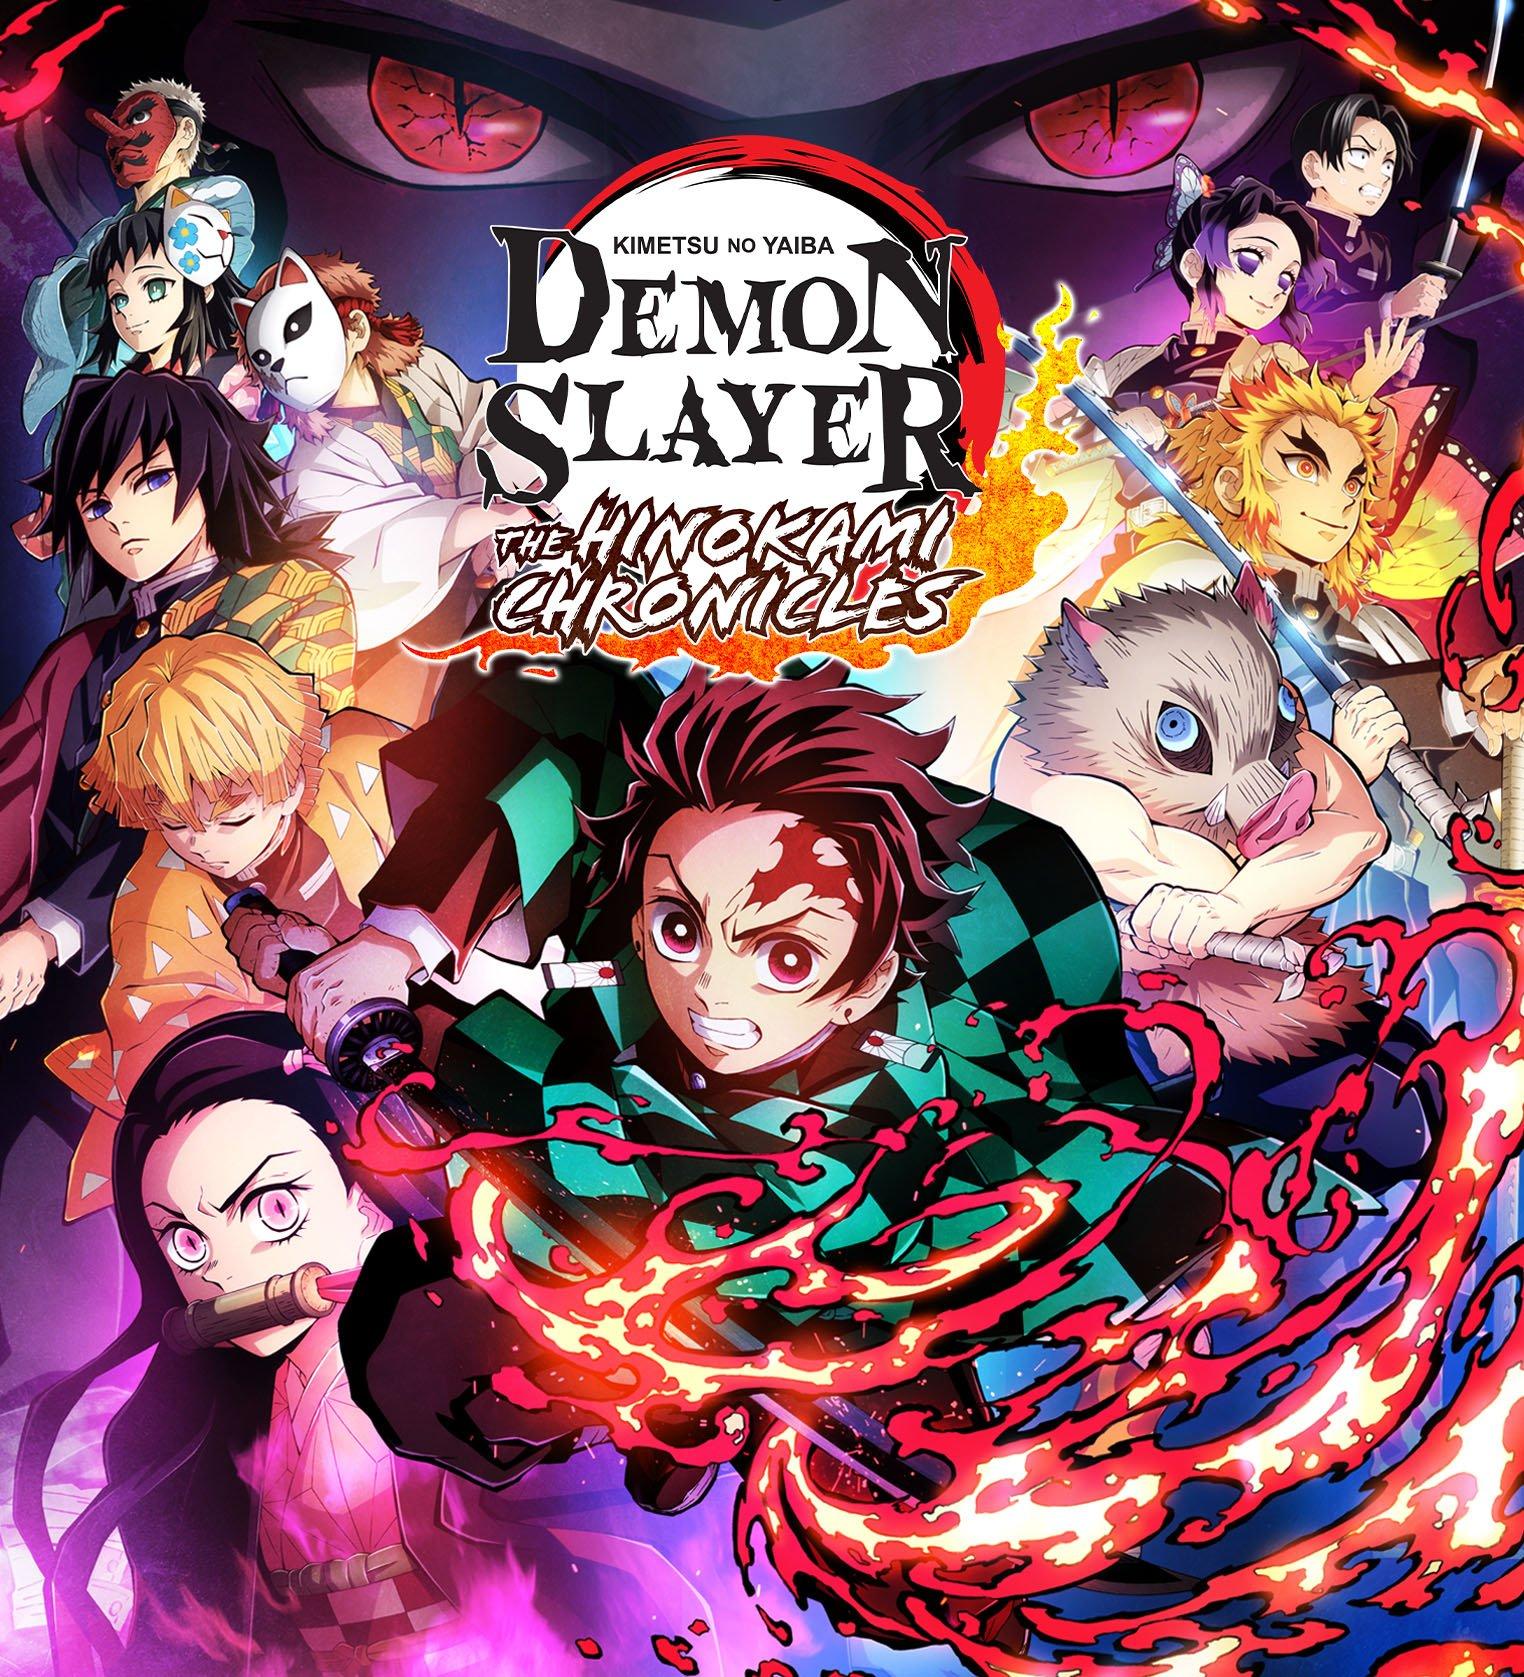 Kimetsu no Yaiba The hinokami Chronicles Demon Slayer Guardians of the Night